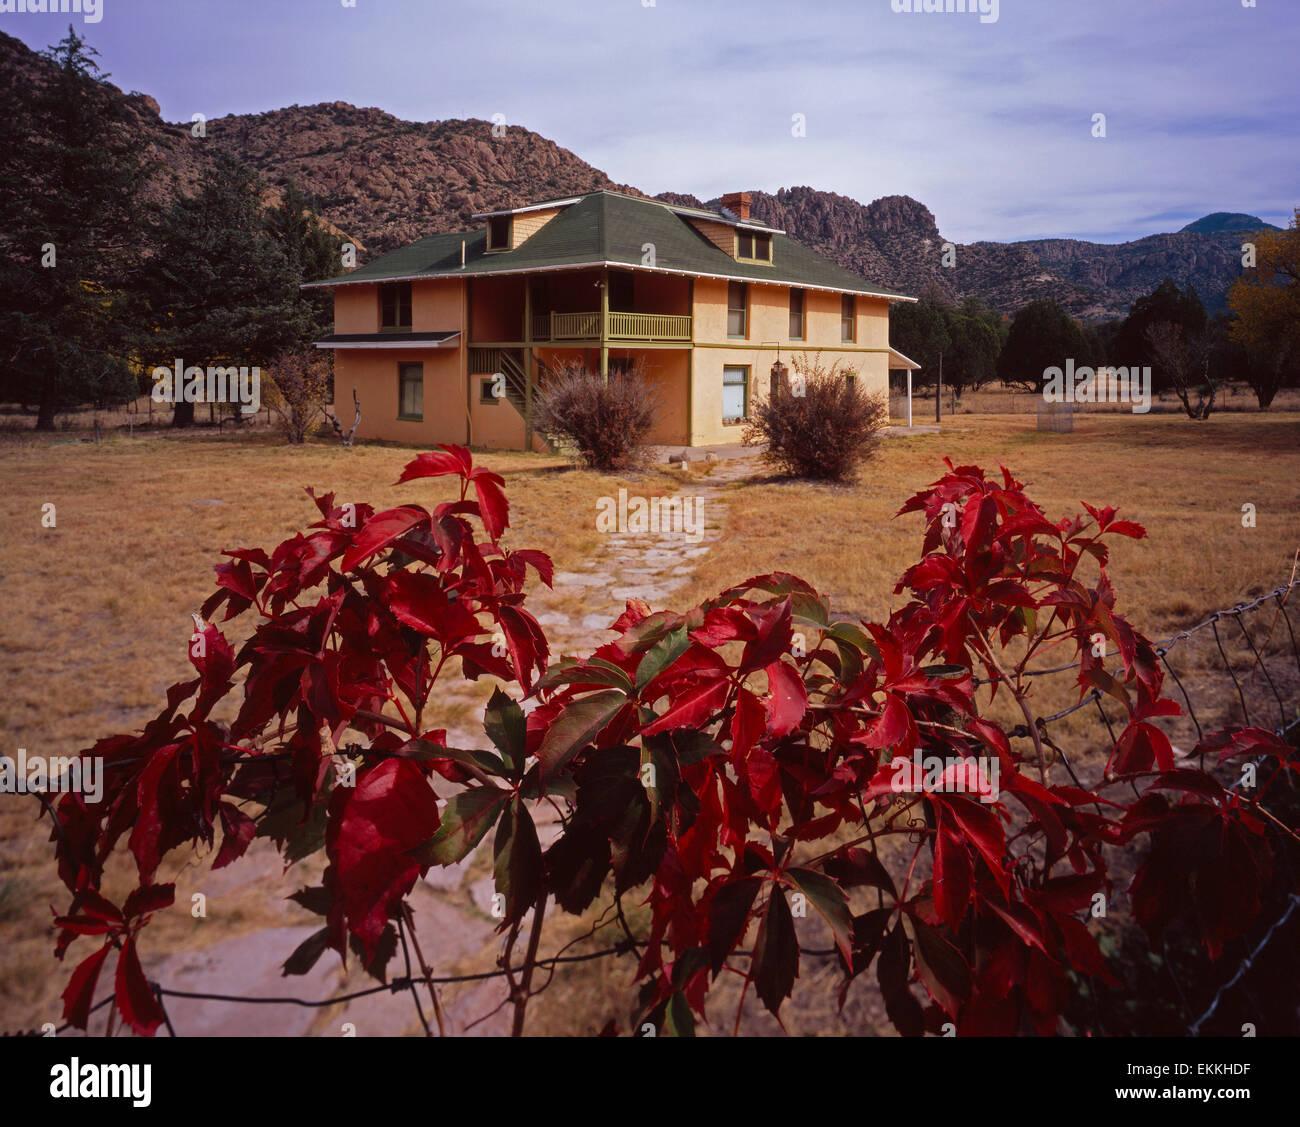 Faraway Ranch, Chiricahua National Monument - Stock Image